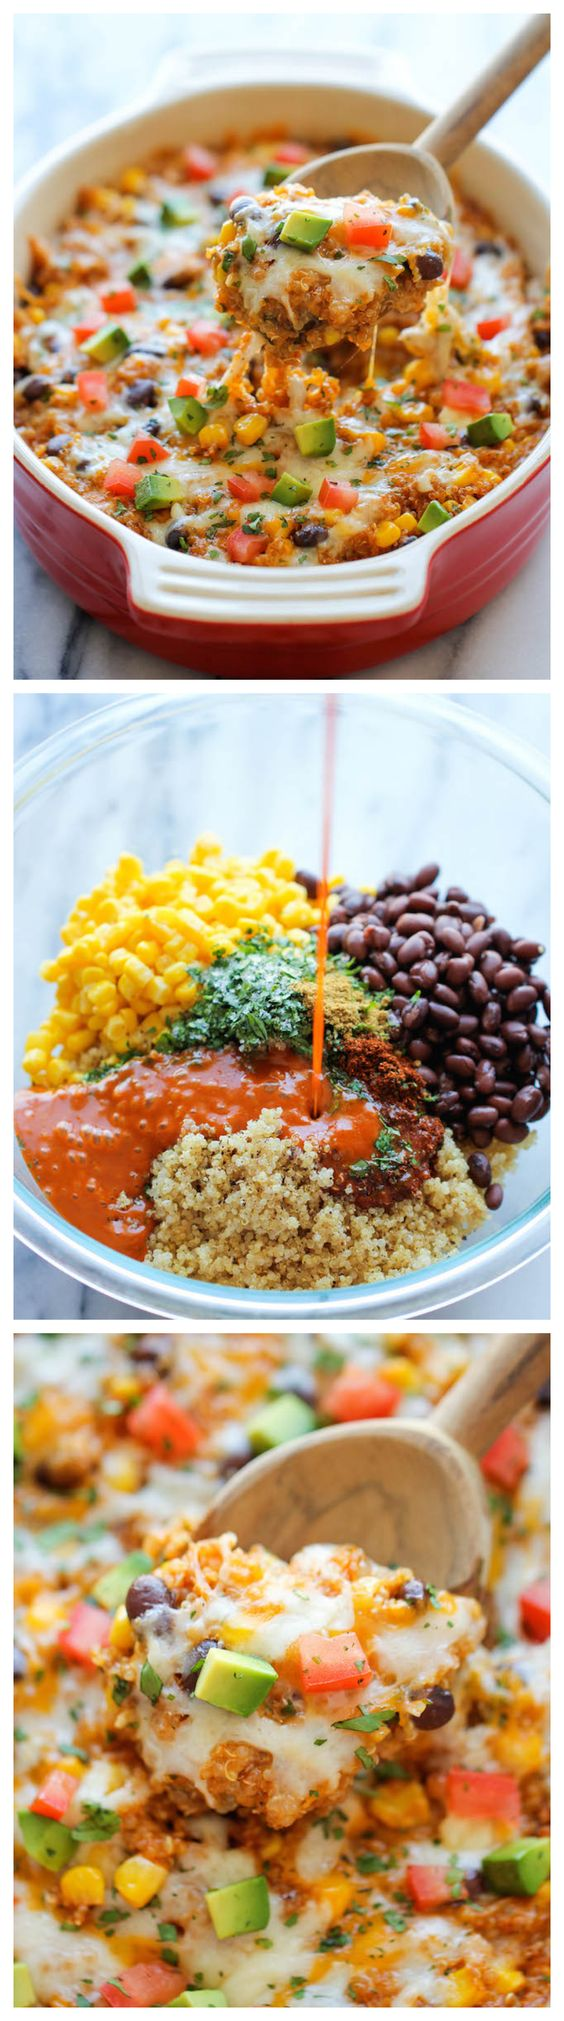 Quinoa Enchilada Casserole - A lightened-up, healthy enchilada bake chockfull of quinoa, black beans and cheesy goodness! @damndelicious